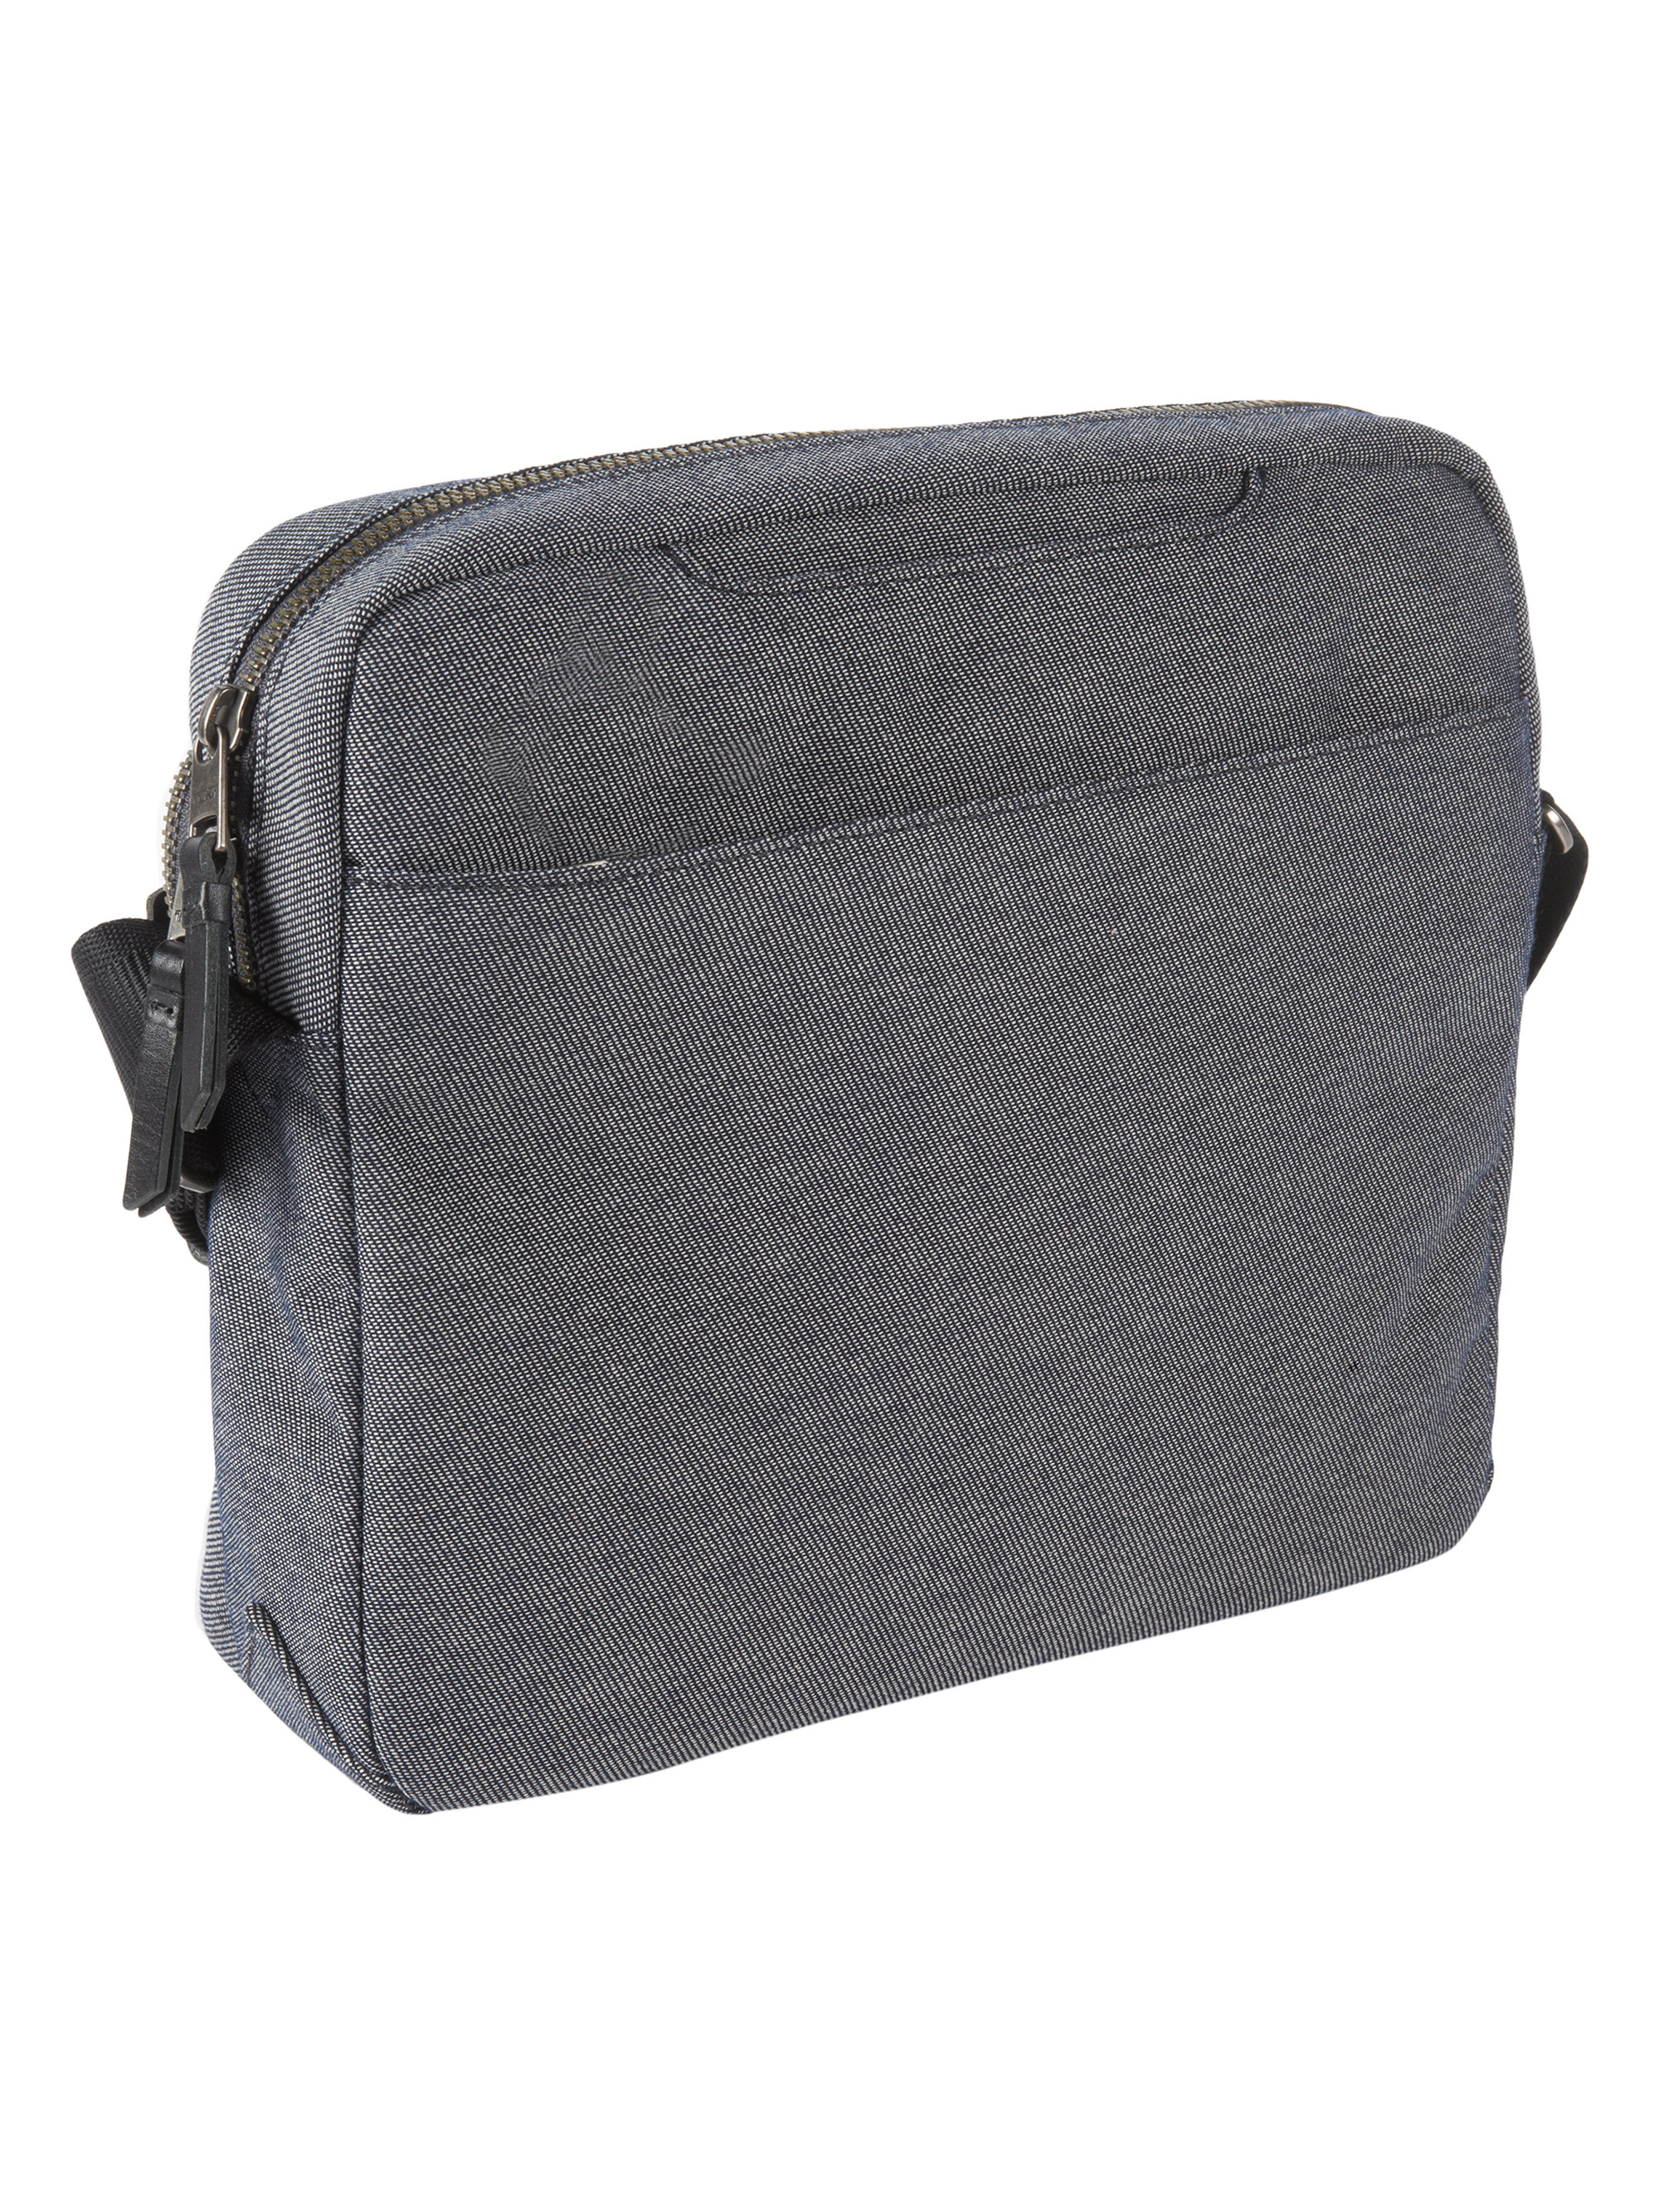 c6754635b197 Lyst - Tumi Dalston Clifton Crossbody Bag in Gray for Men